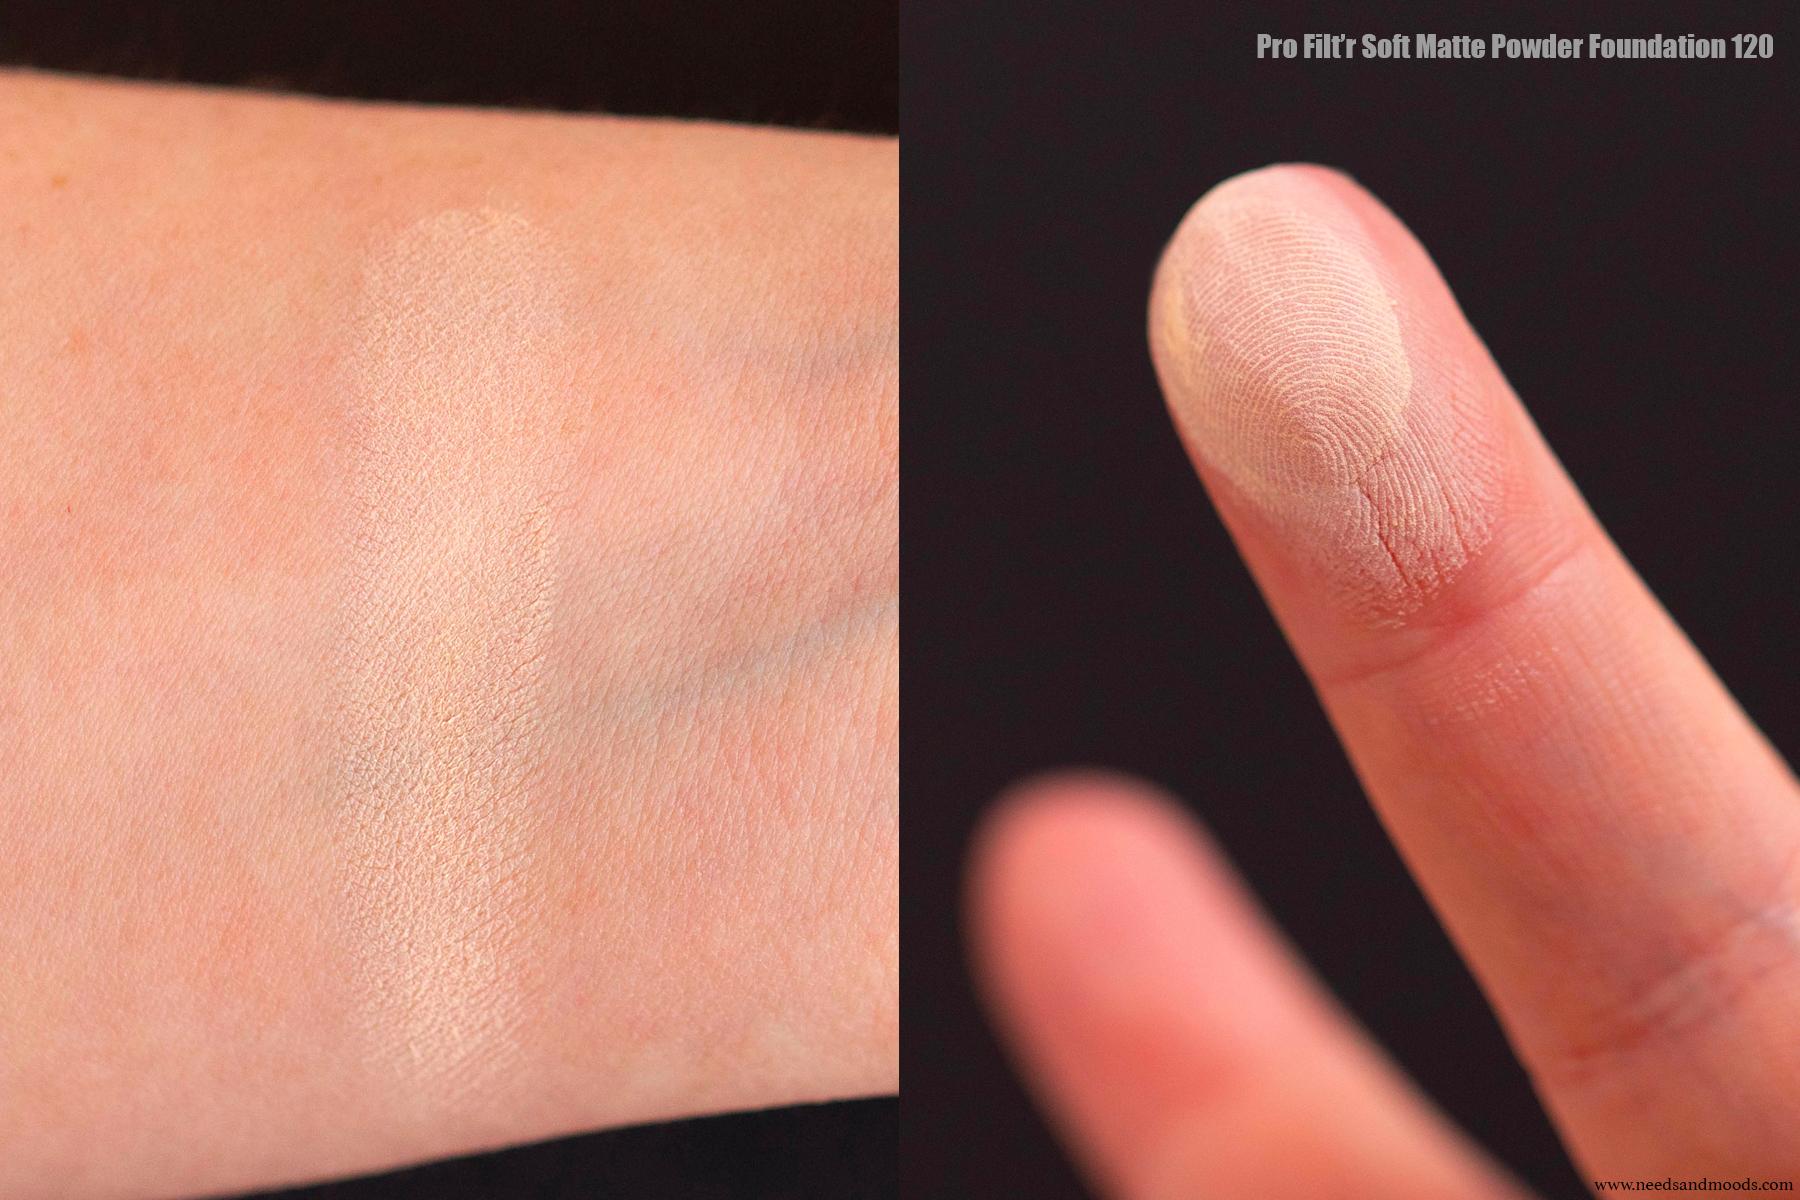 fenty-beauty-pro-filt'r-soft-matte-powder-foundation-swatch-120